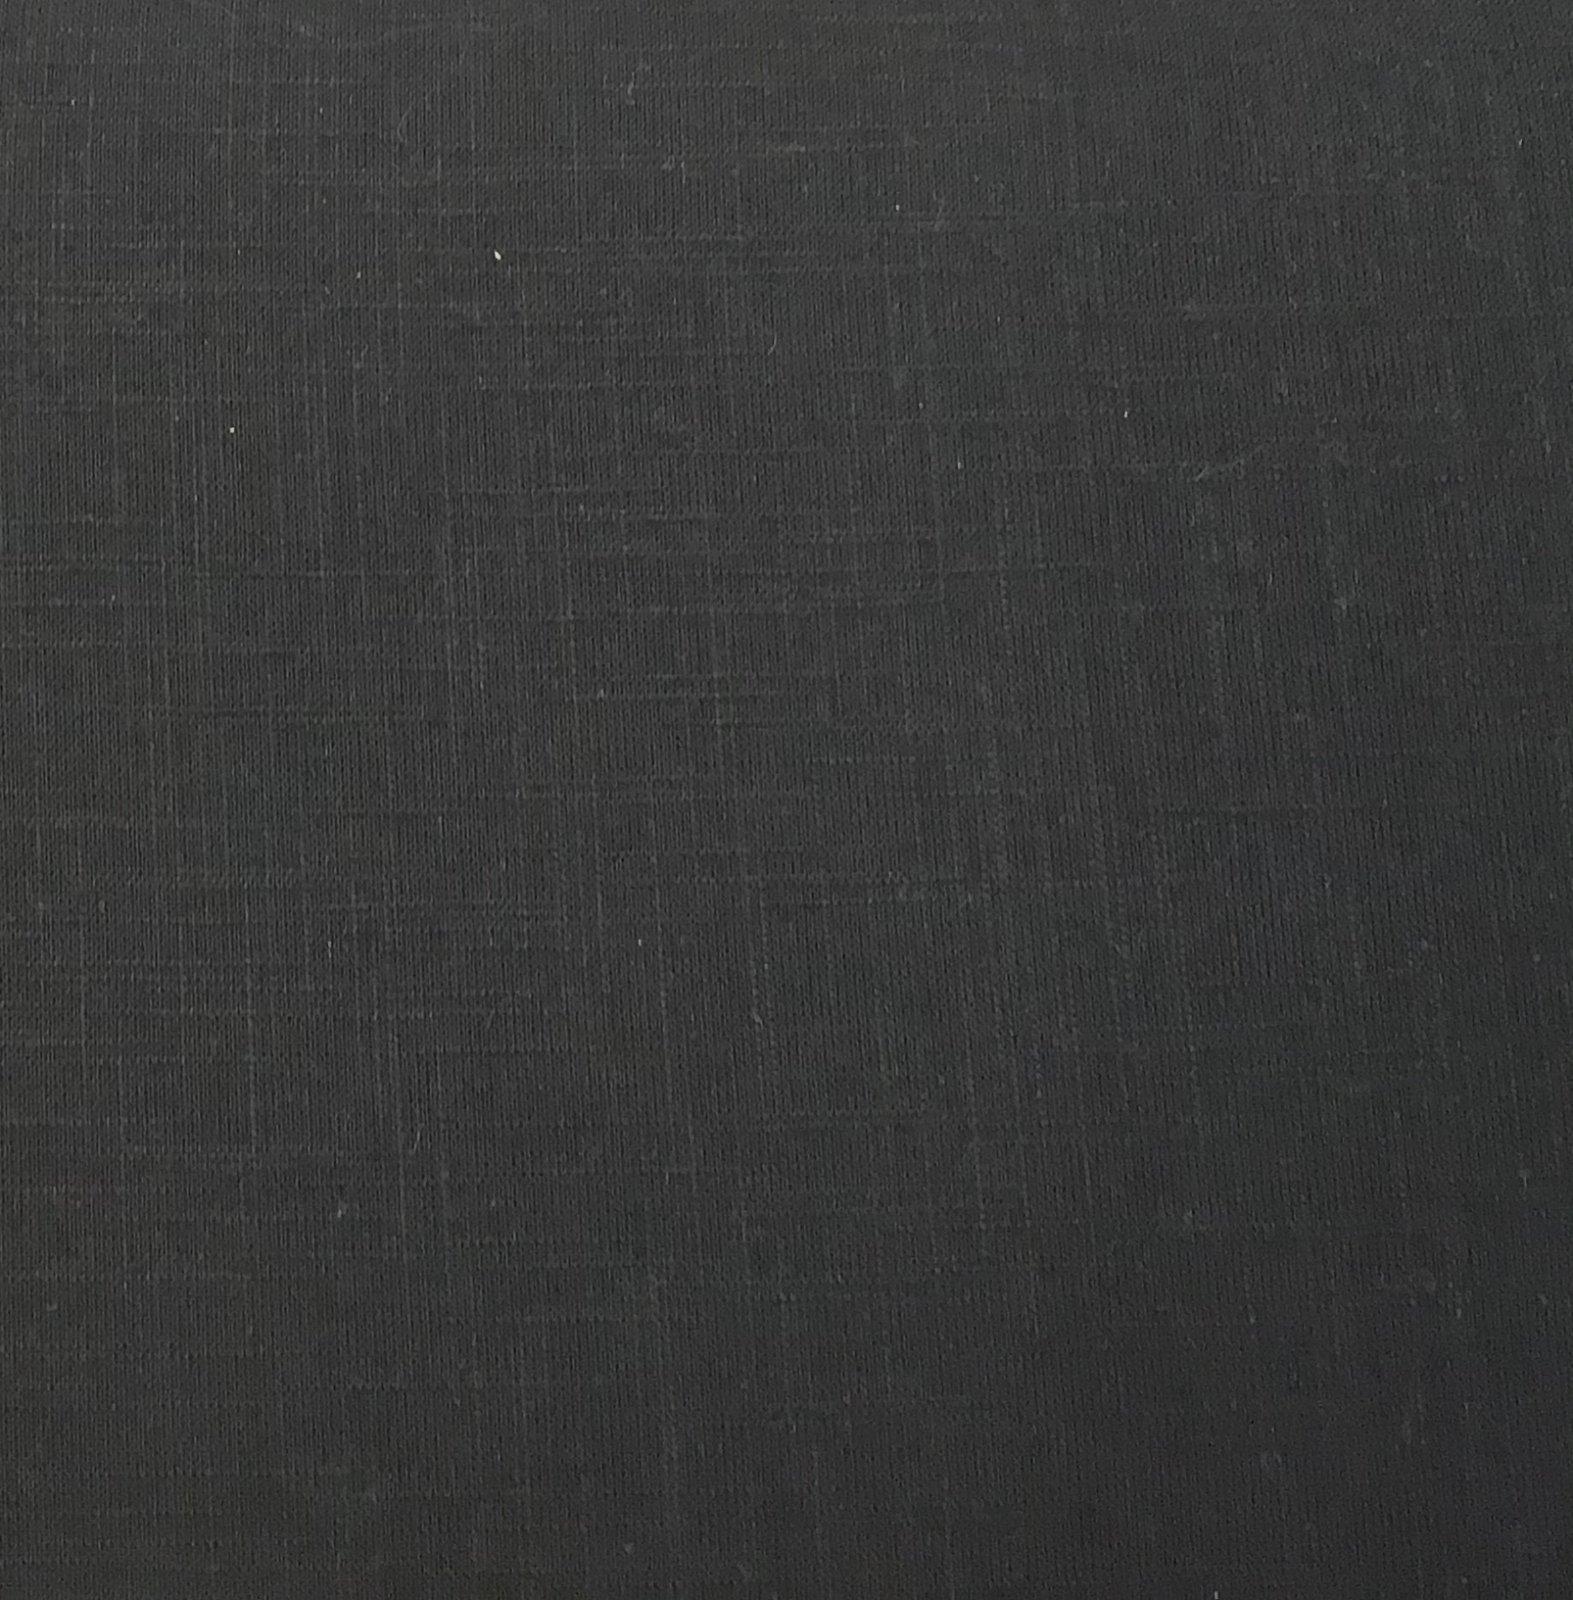 Black Manchester Dyed Yarn